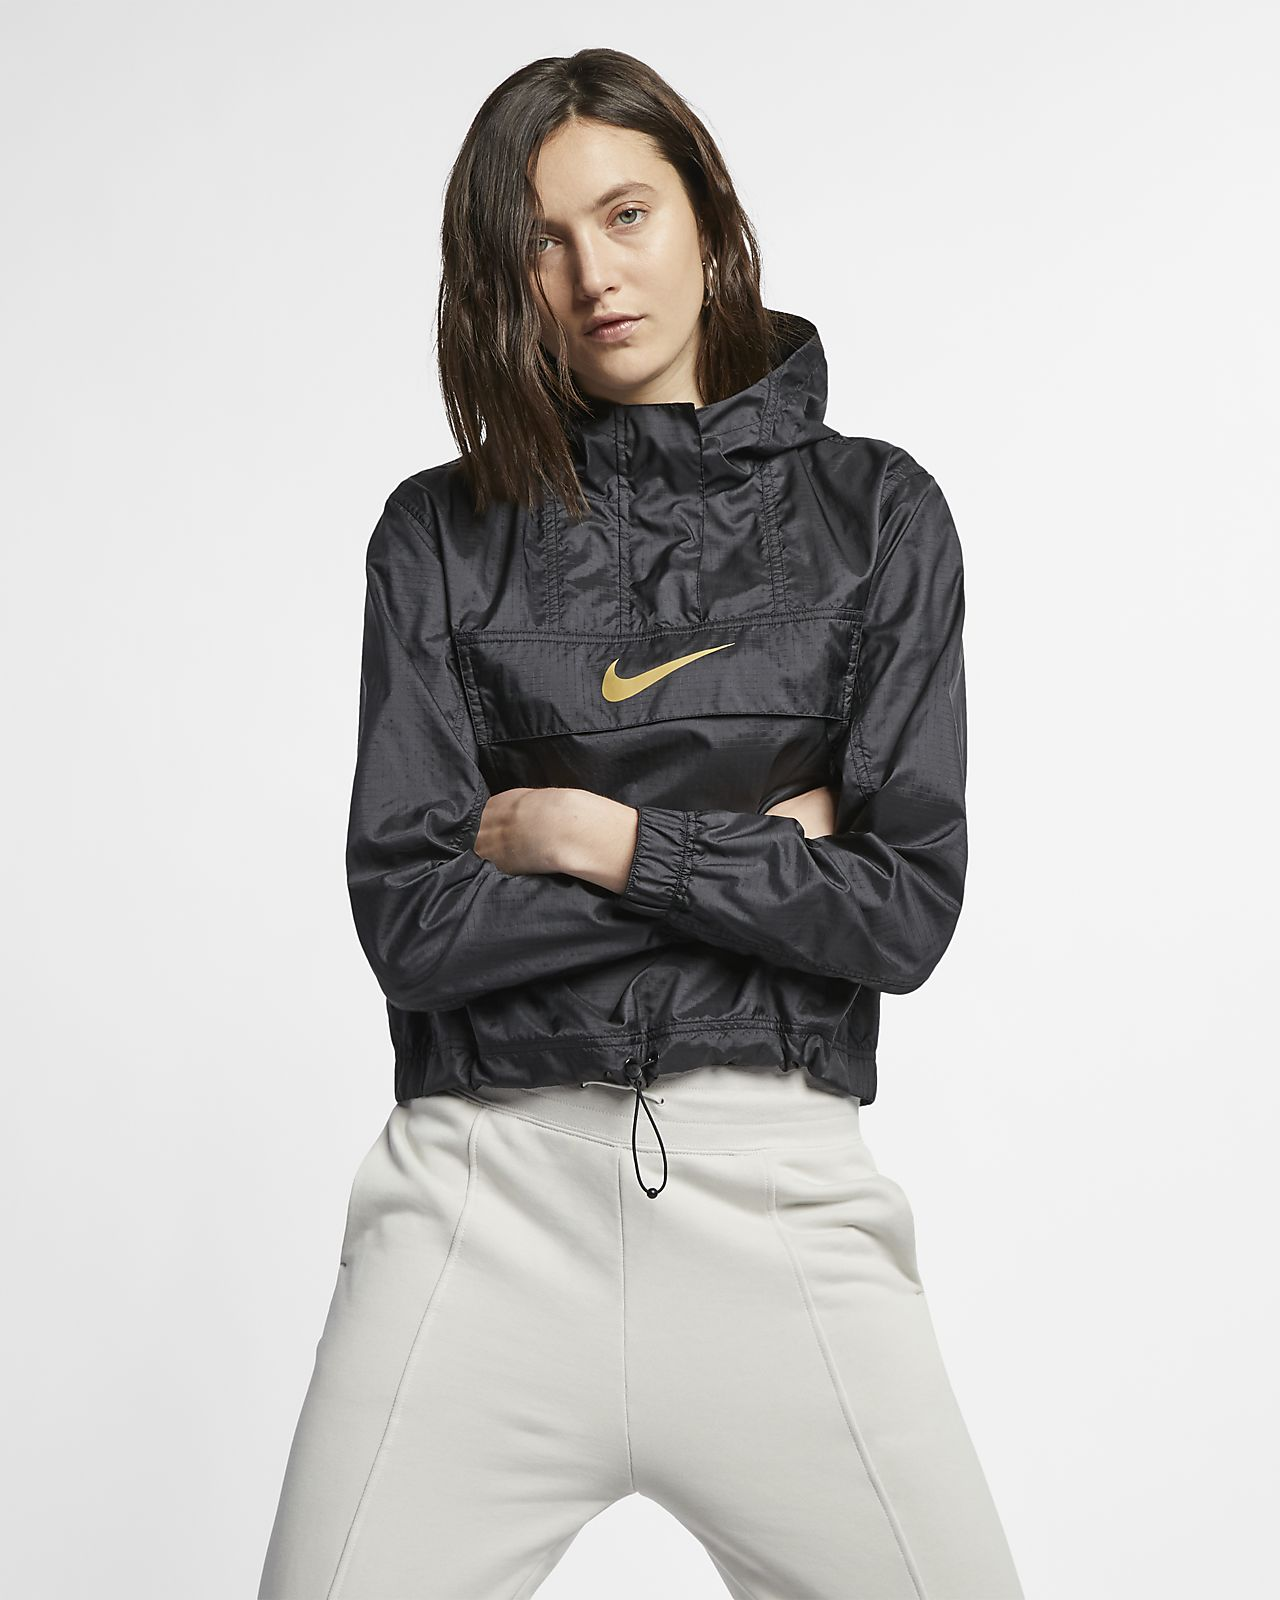 Nike Sportswear Animal Print Paravent lleuger - Dona